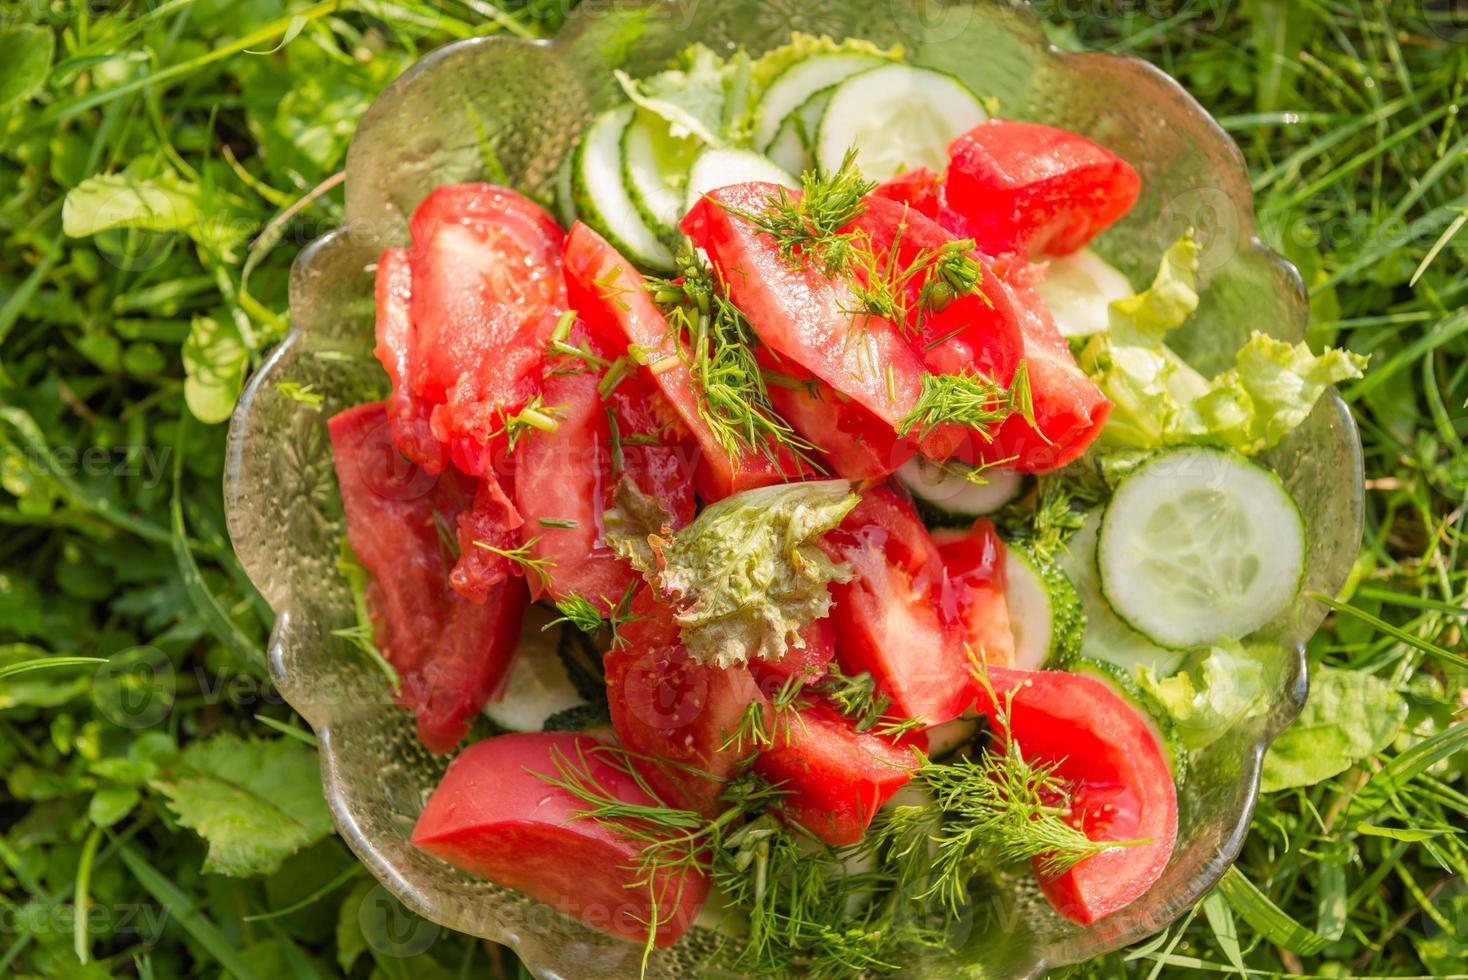 sla, tomaten en komkommers in een glazen kom foto